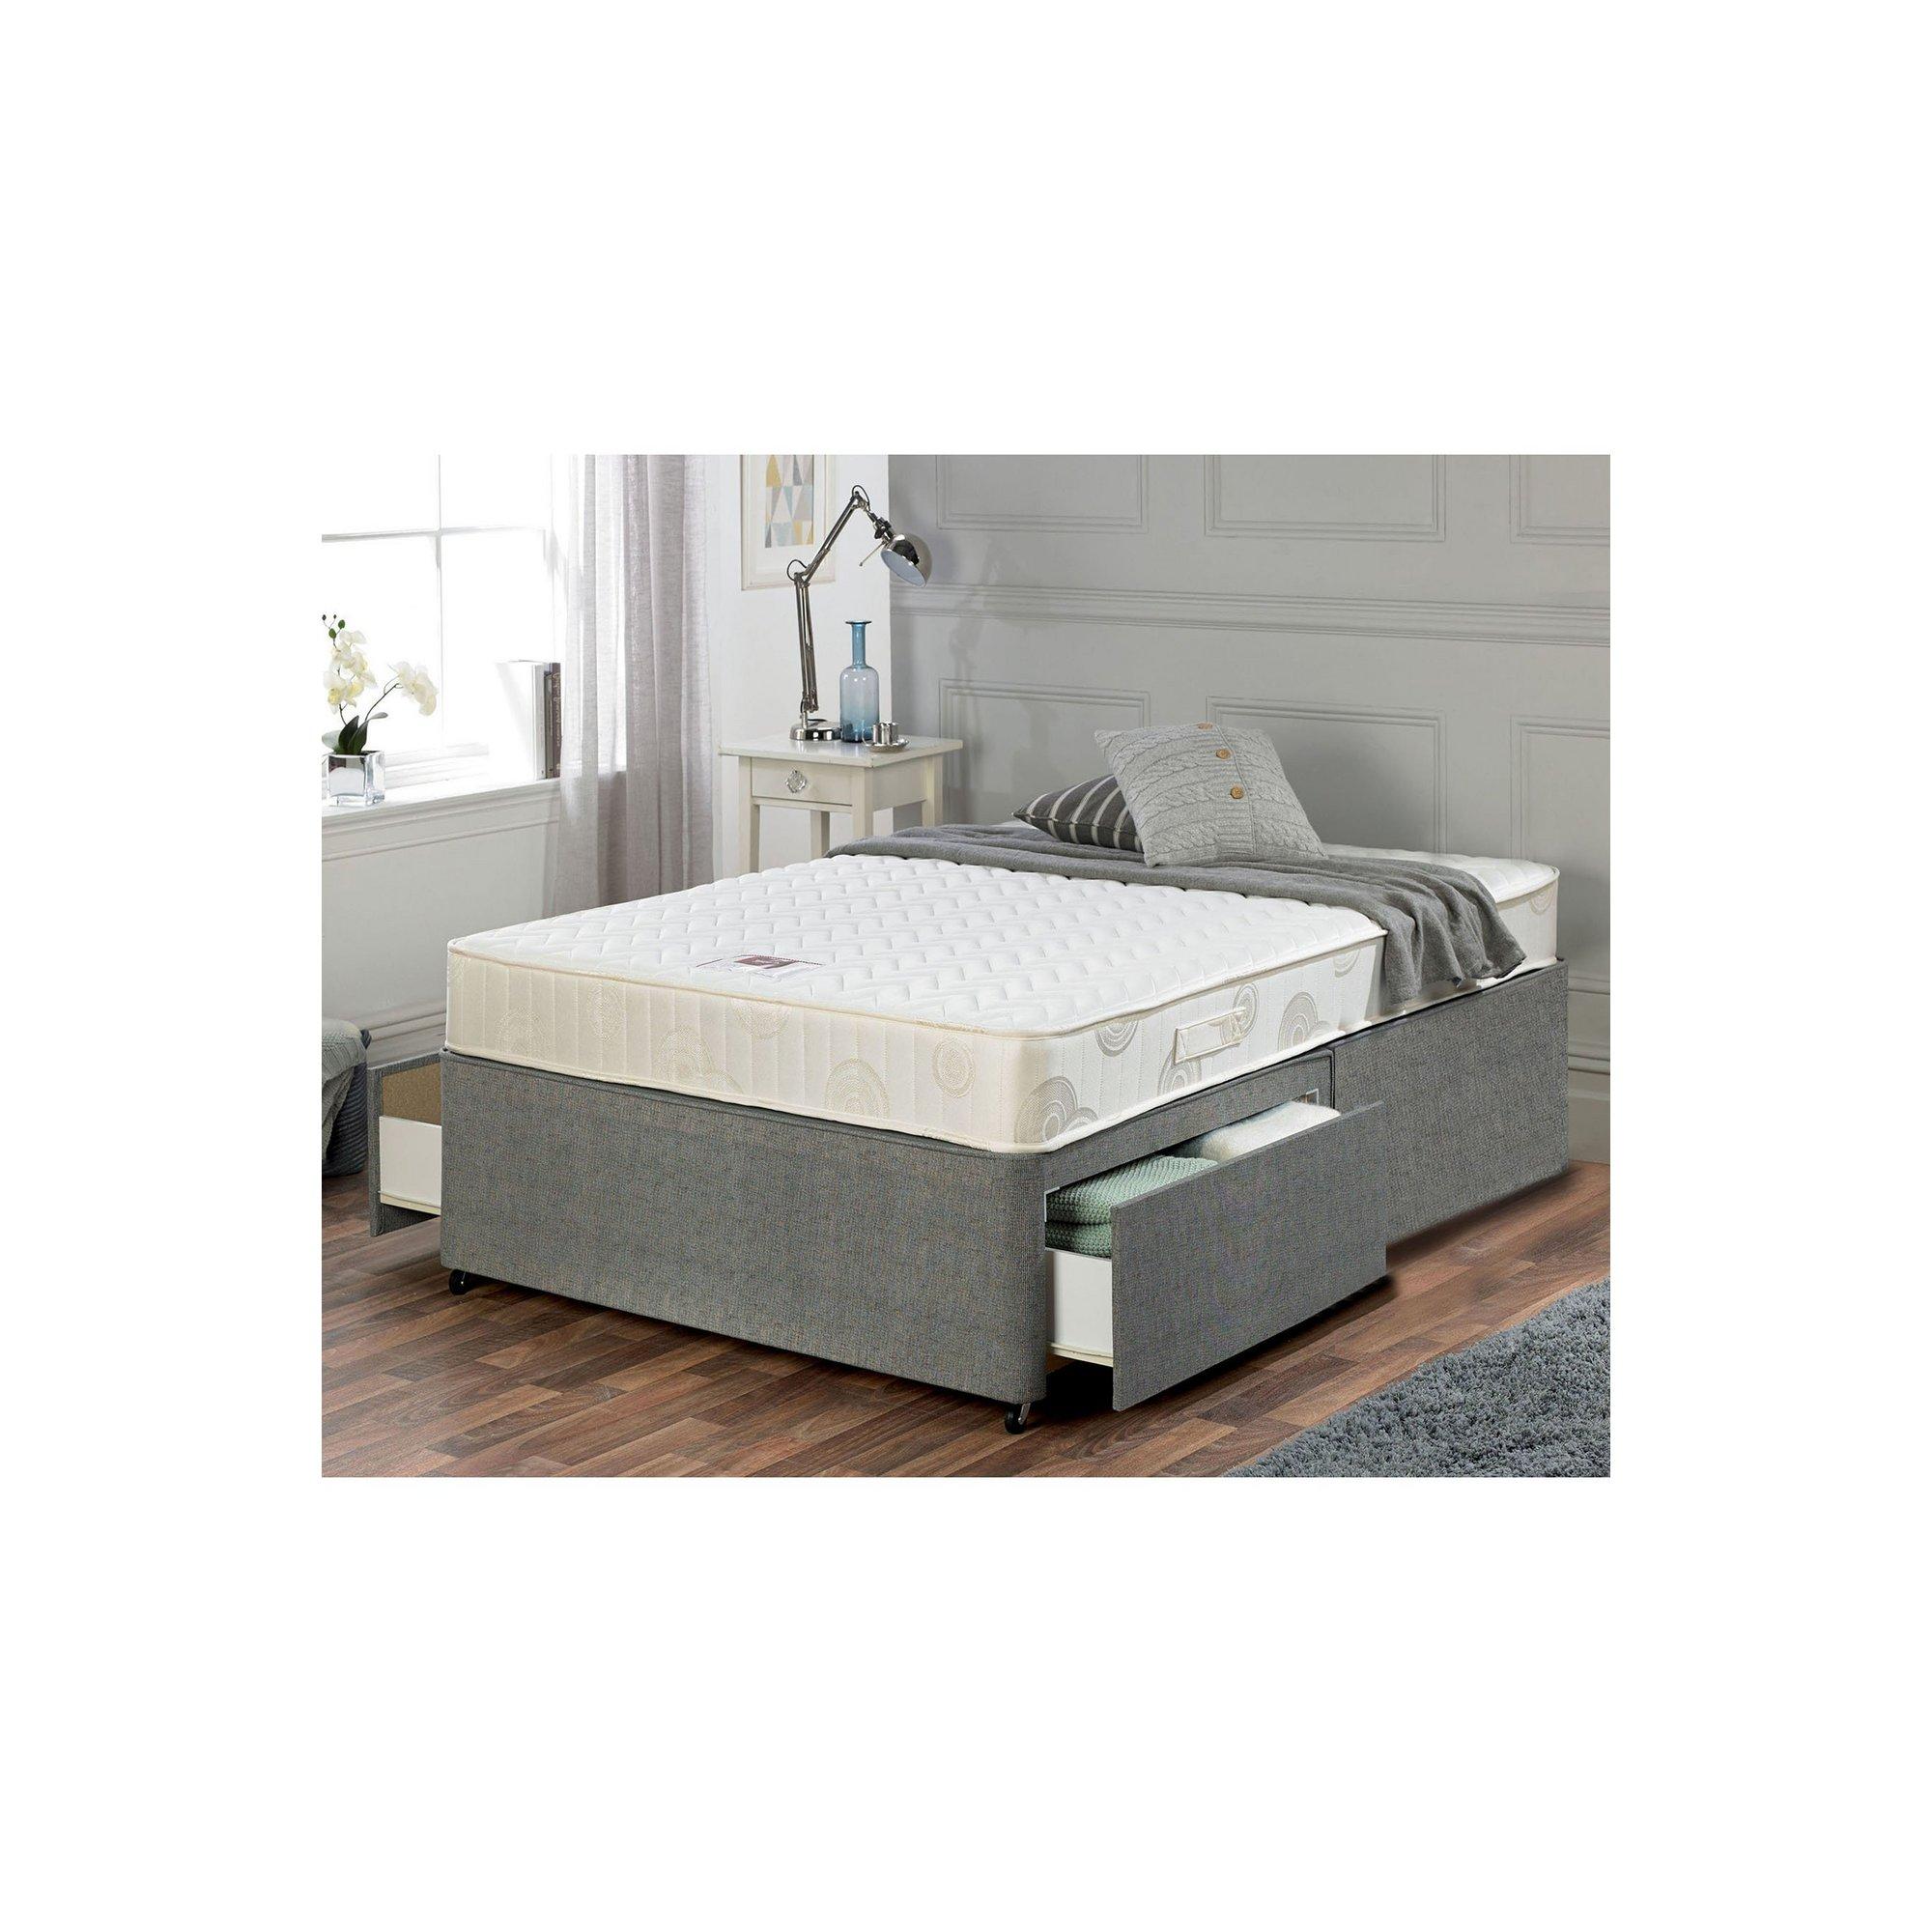 Image of Airsprung Memory Flex Divan Bed - 2 Drawer Storage